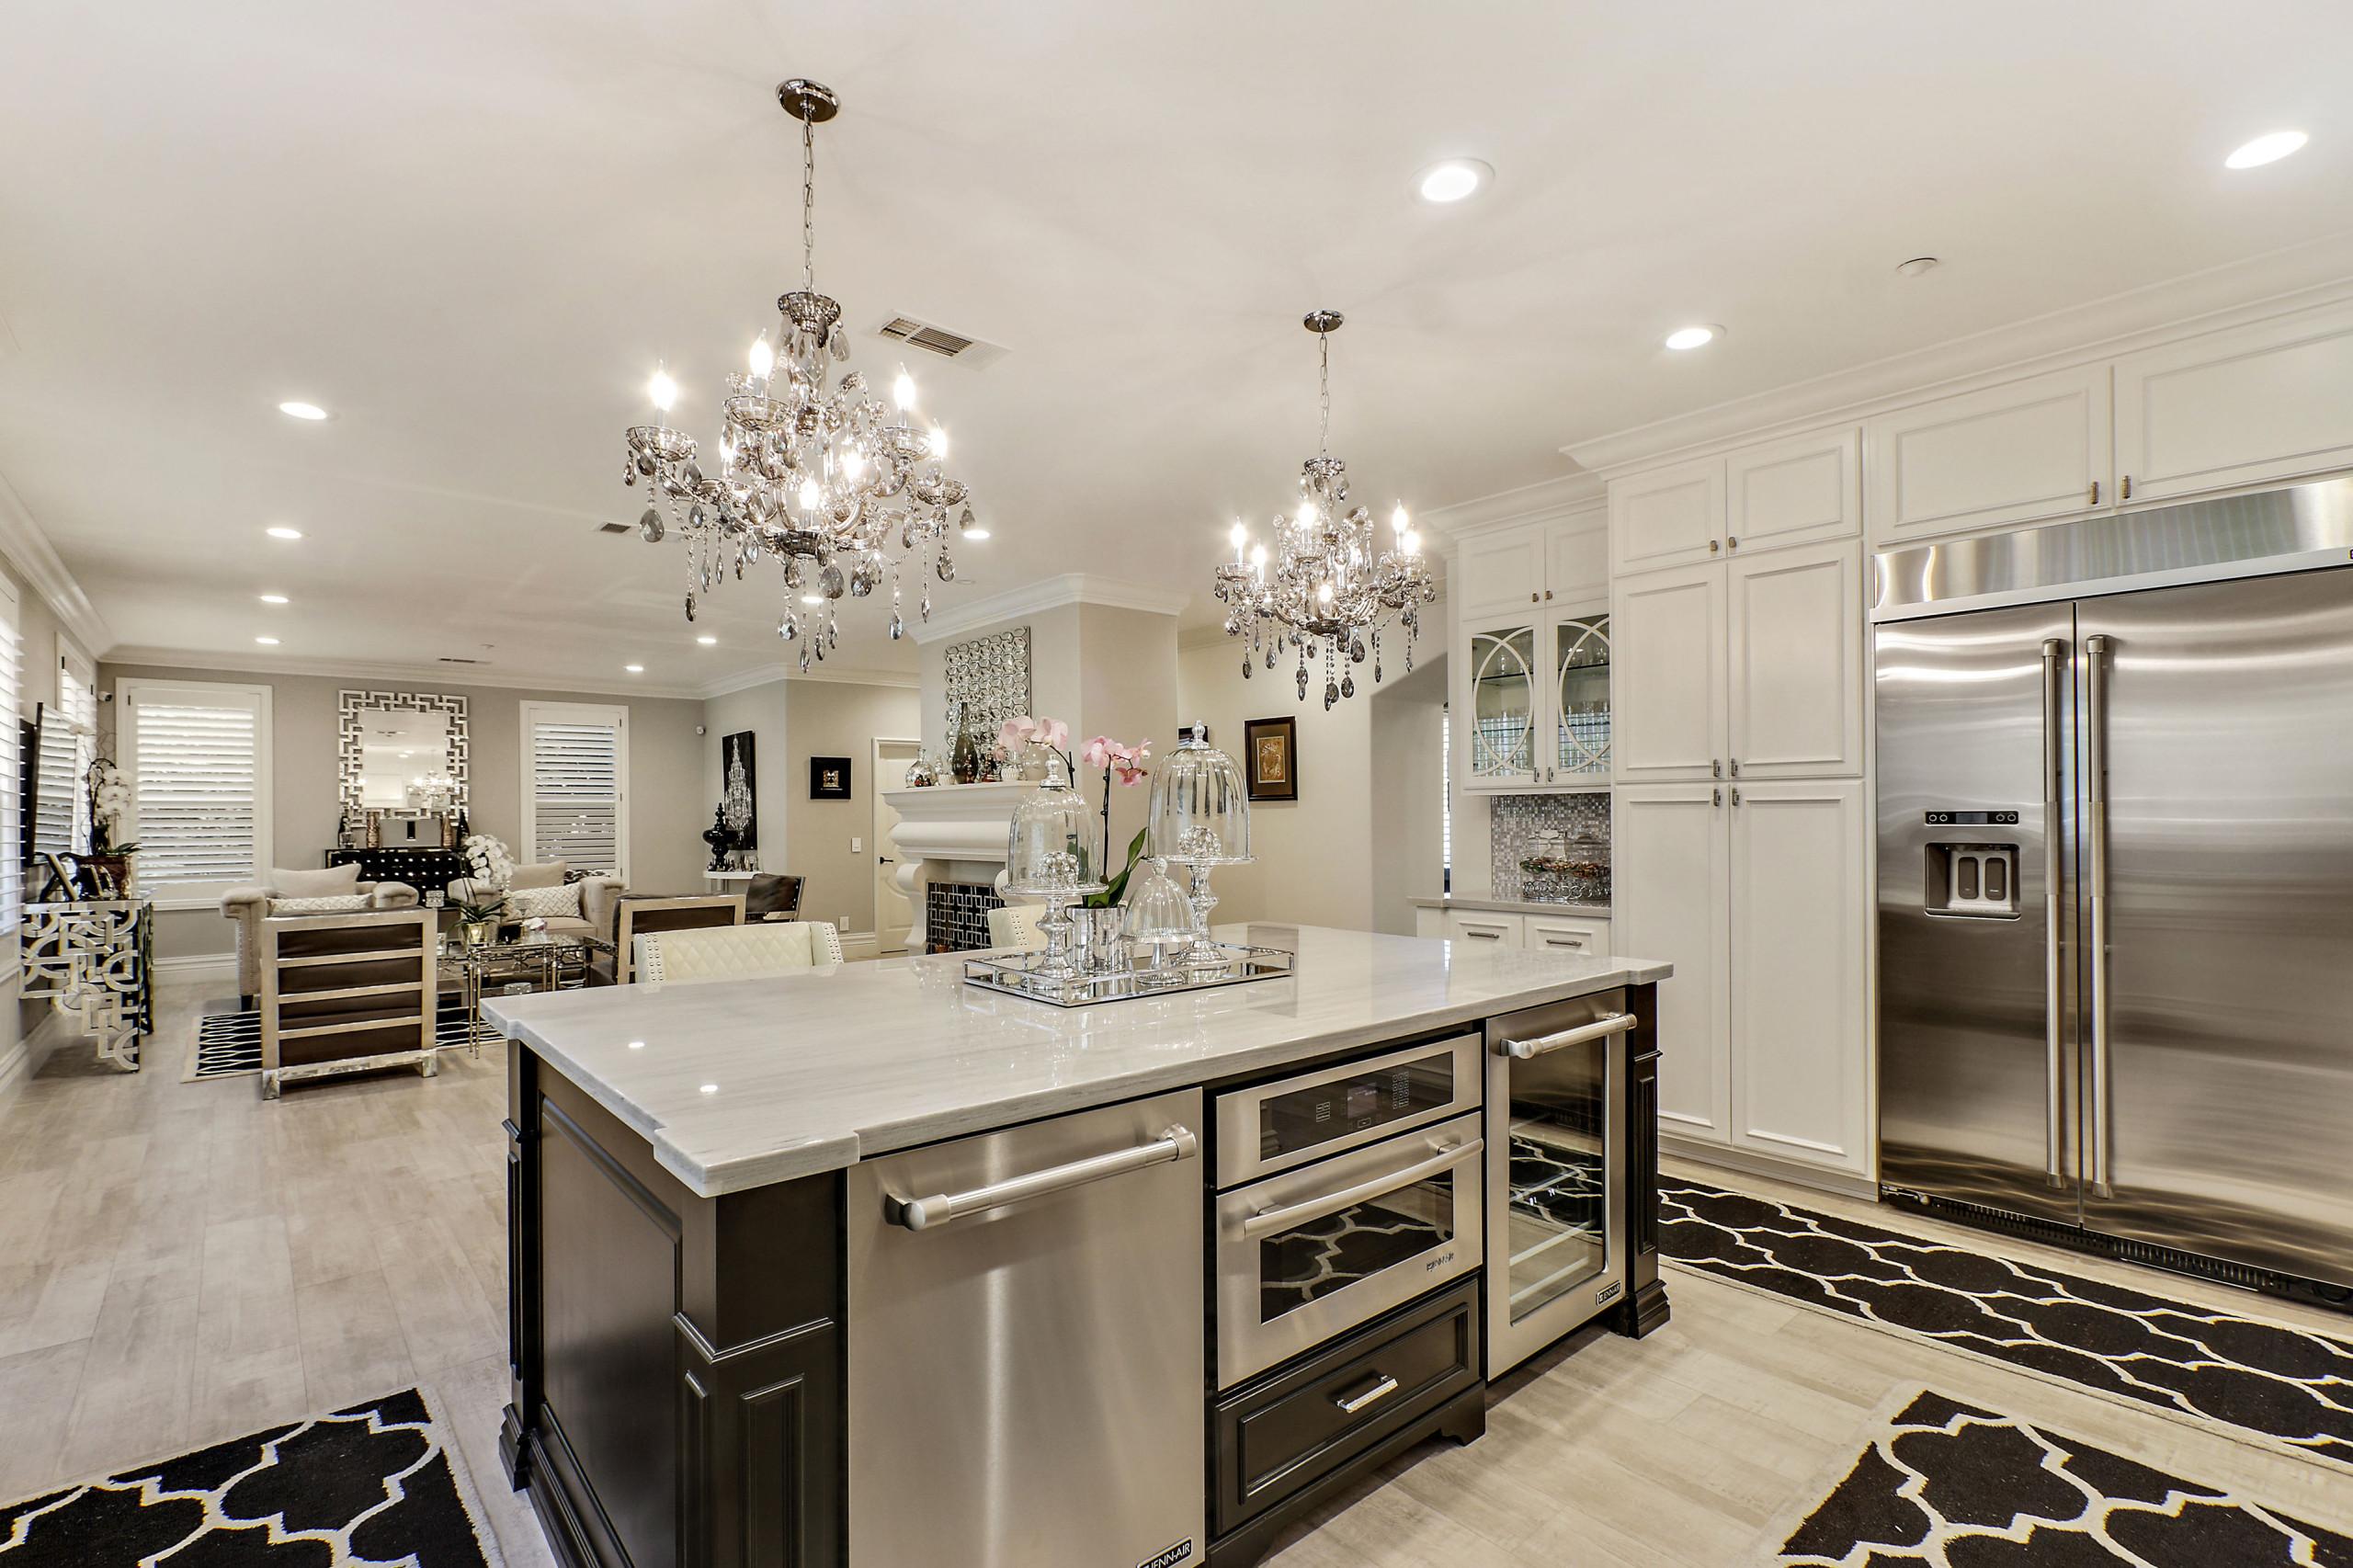 Ebony and Ivory Dream Kitchen